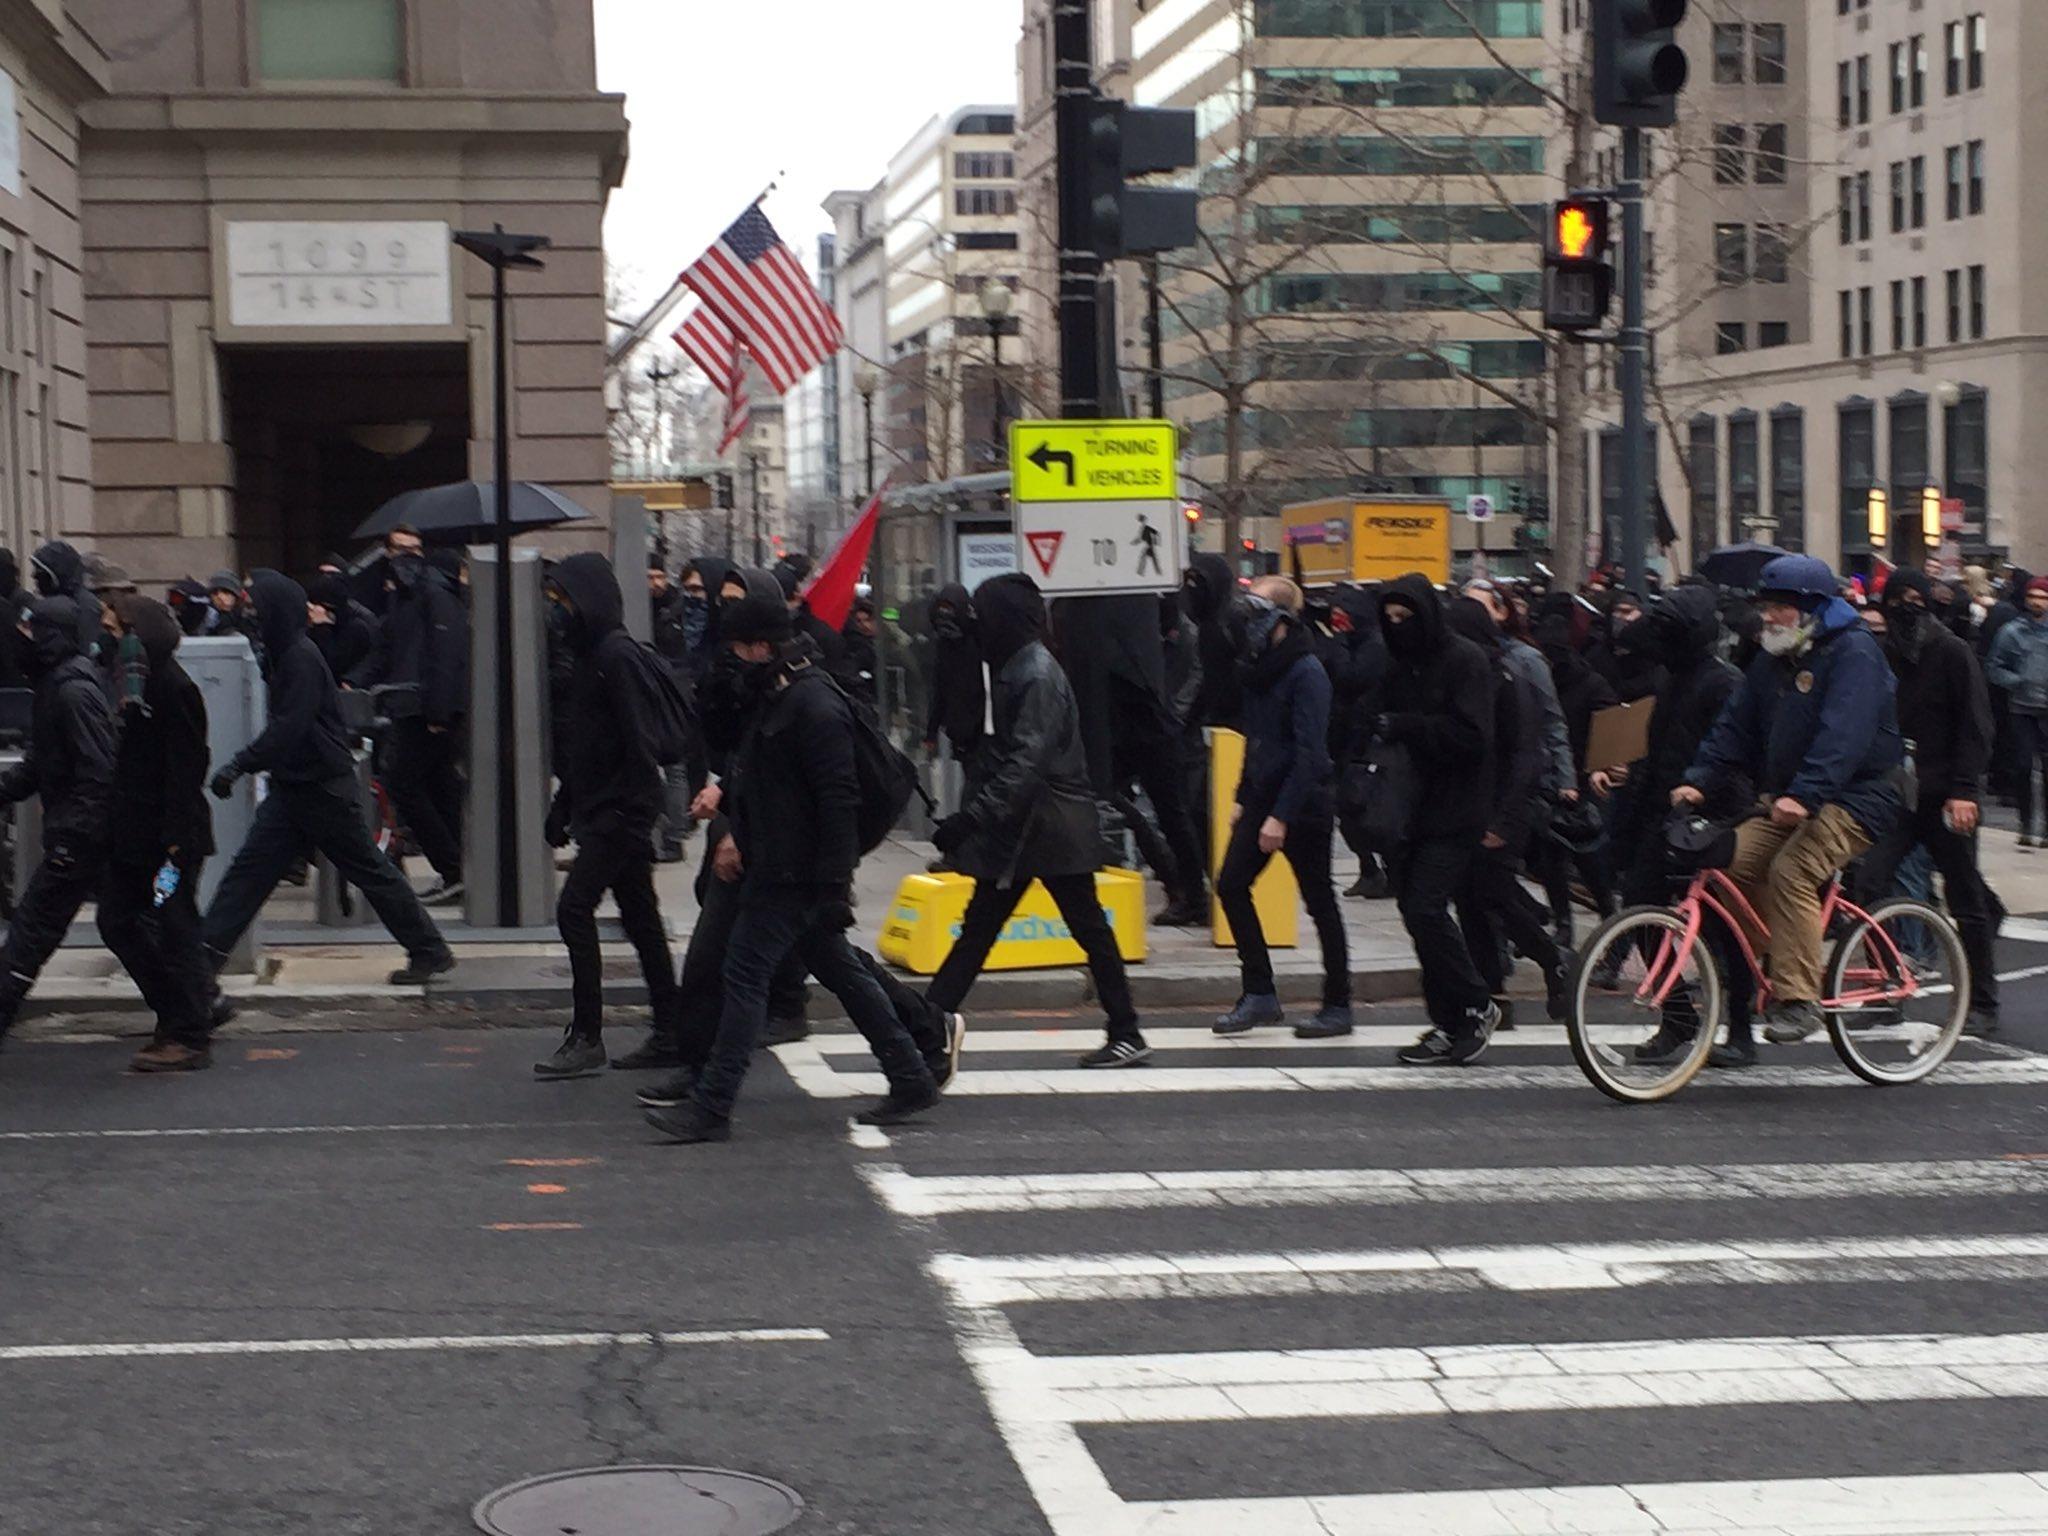 Black Bloc January 20 (Credit: Baynard Woods)